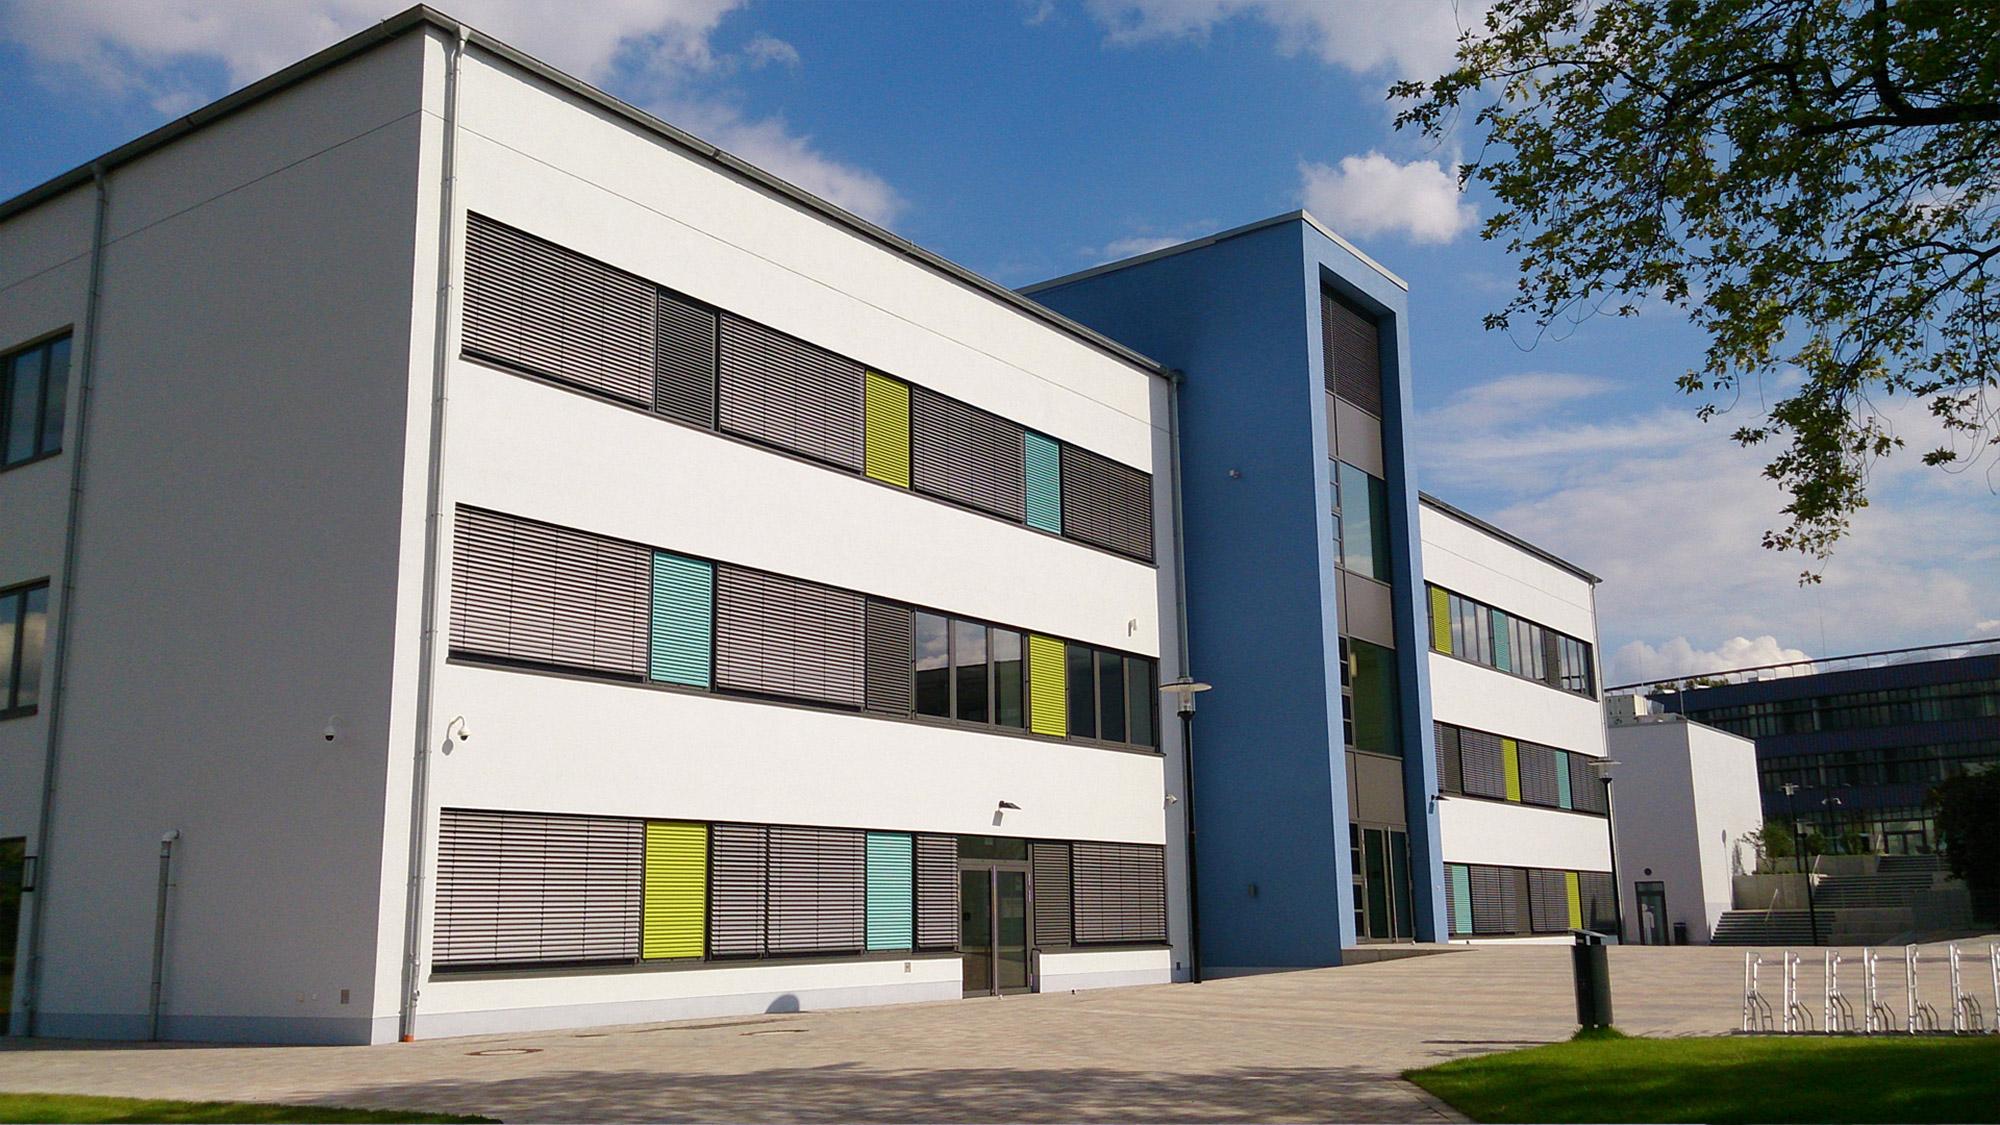 Hans-Böckler-Schule Bochum